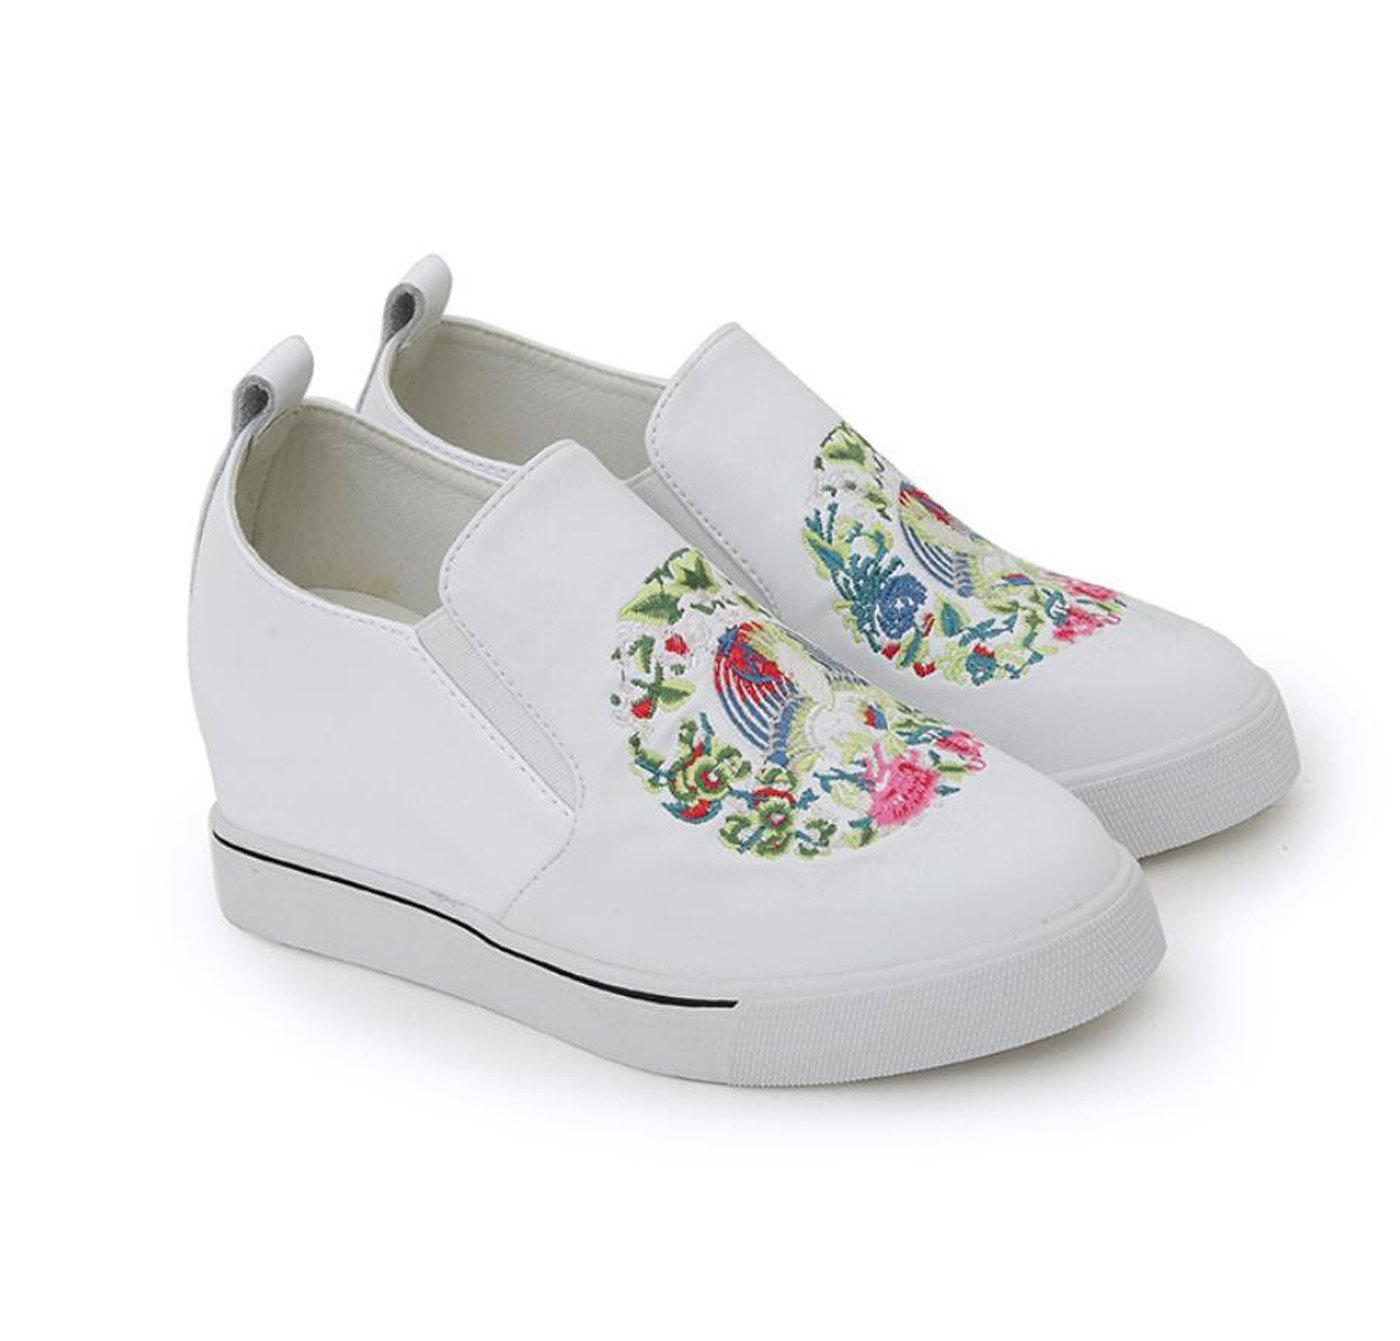 wholesale dealer 472f9 b621a Damenschuhe Maumldchen Versteckte Keilabsatz Plateau Sandalen Loafers  Casual Ethnischen Stil Stickerei Outdoor-Schuhe